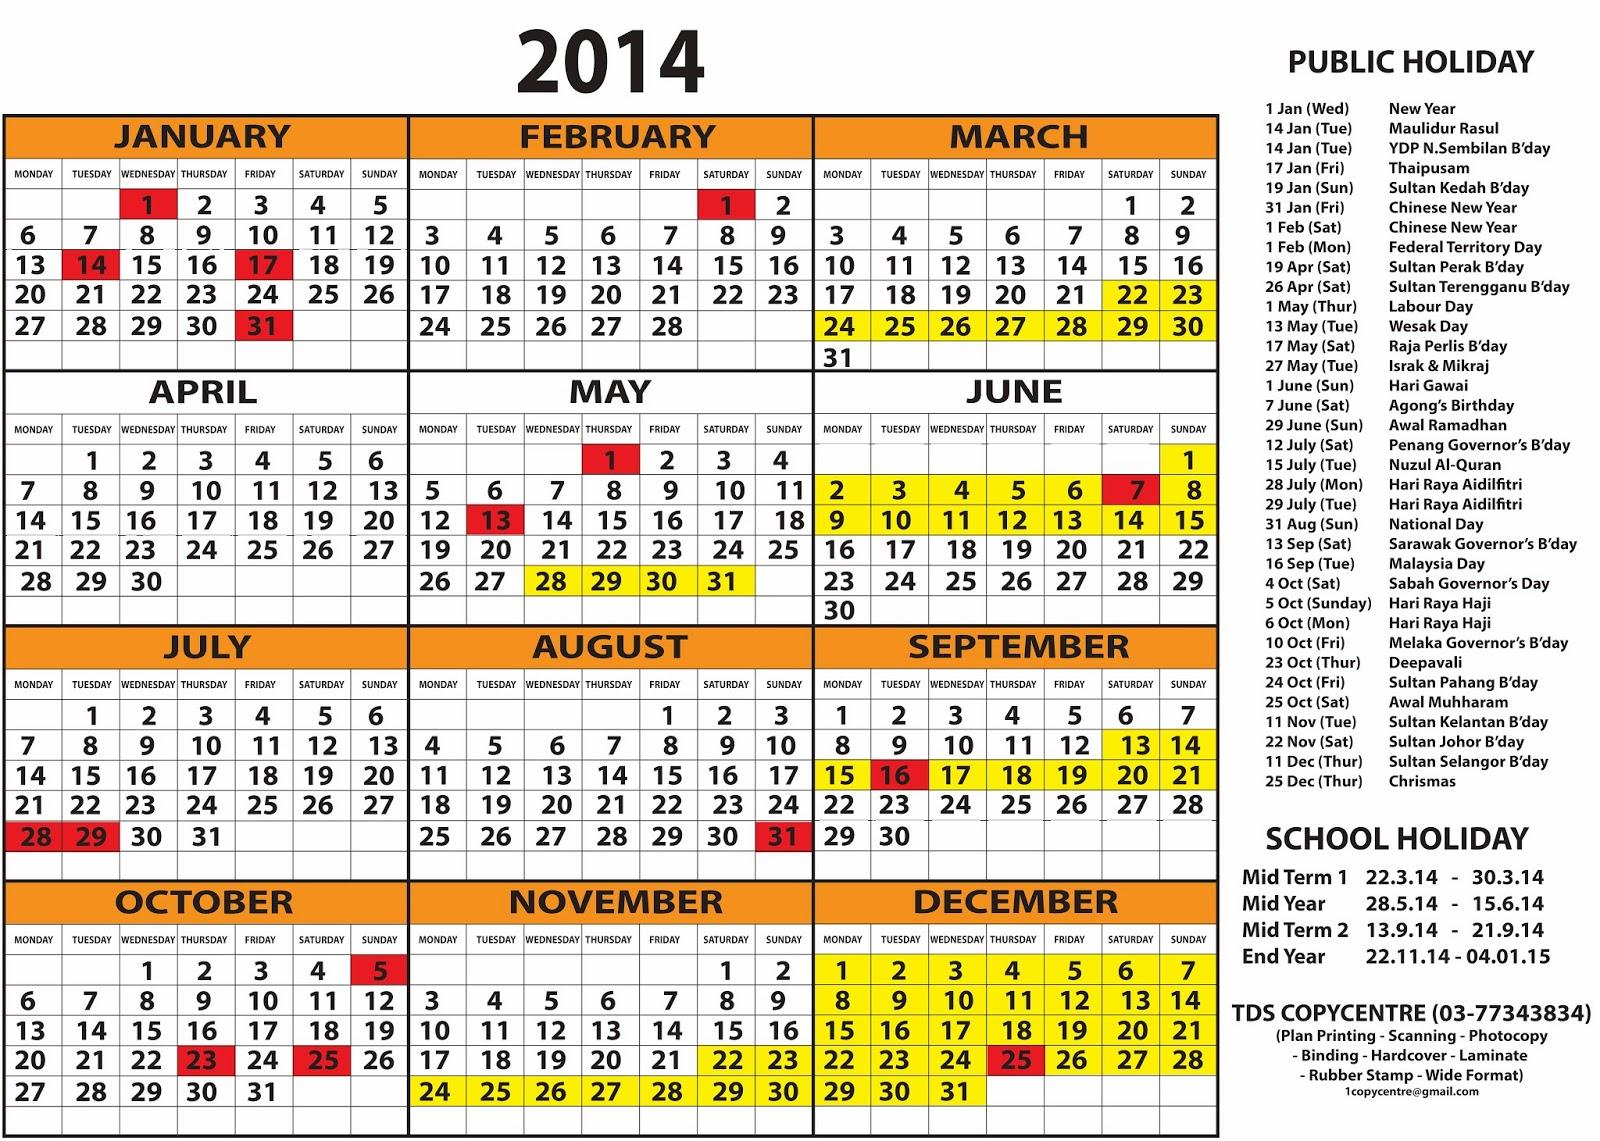 Kalendar 2014 Printable, 2014 Calendar Printable ,2014